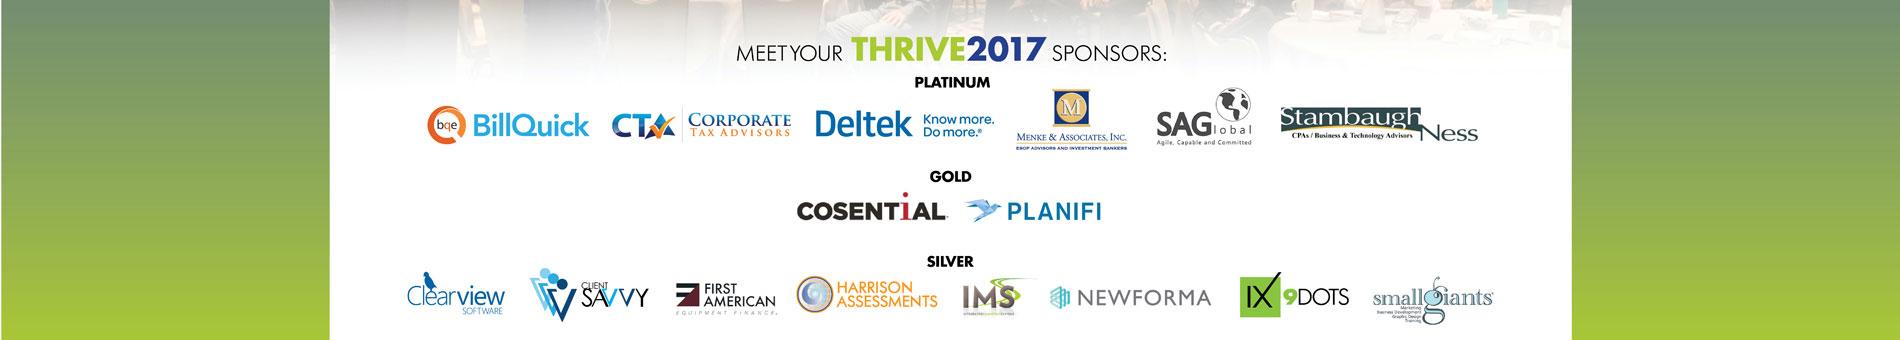 THRIVE 2017 Sponsors